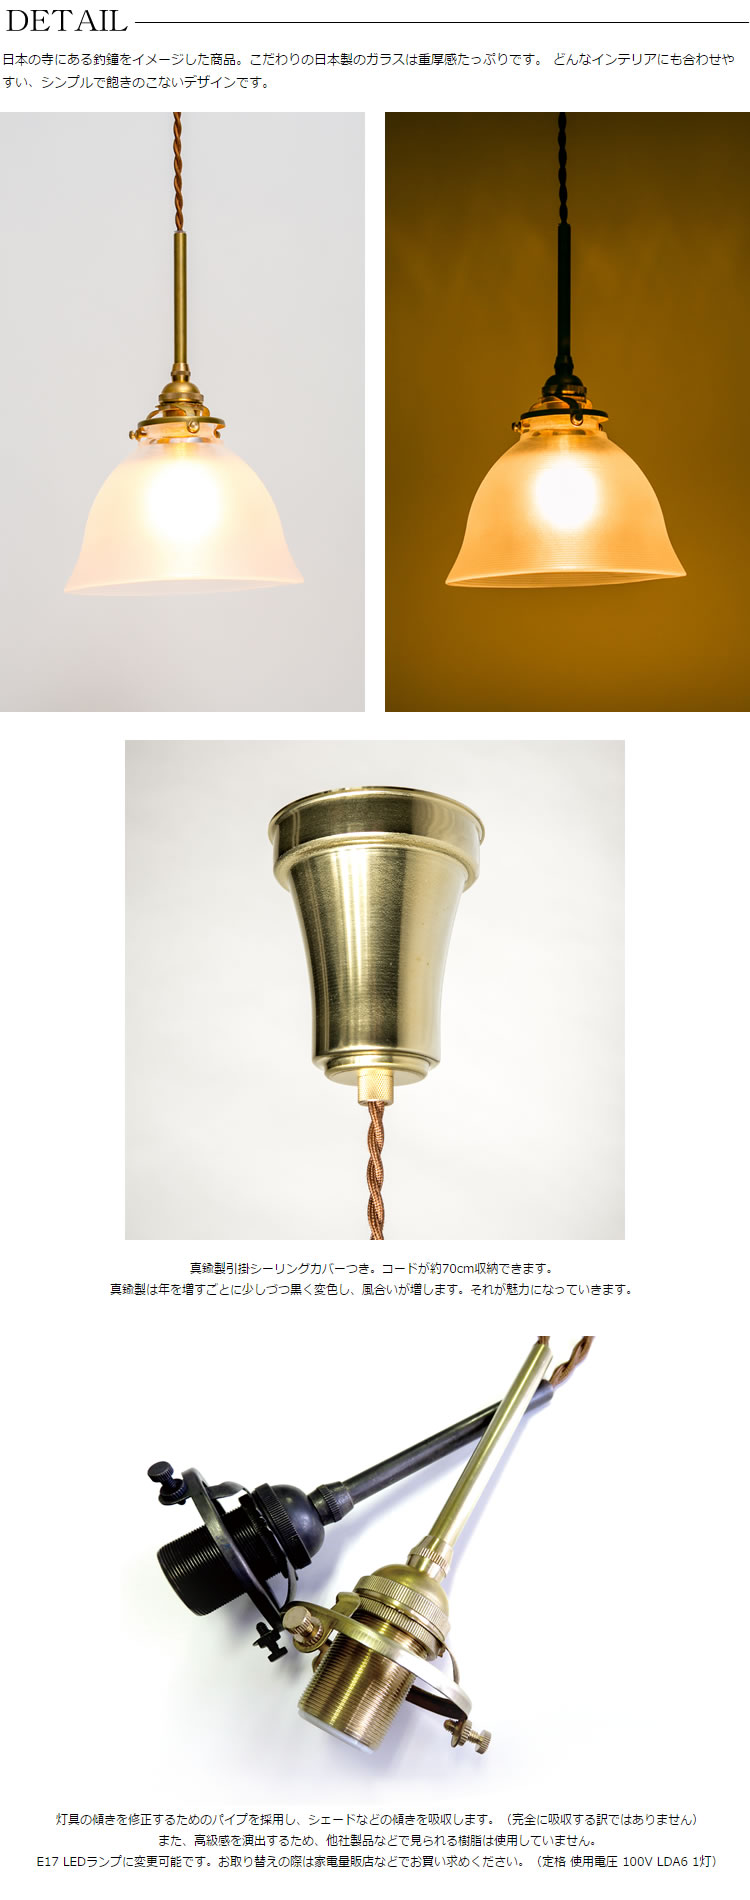 TSURIGANE(ガラス消し・引掛・真鍮)